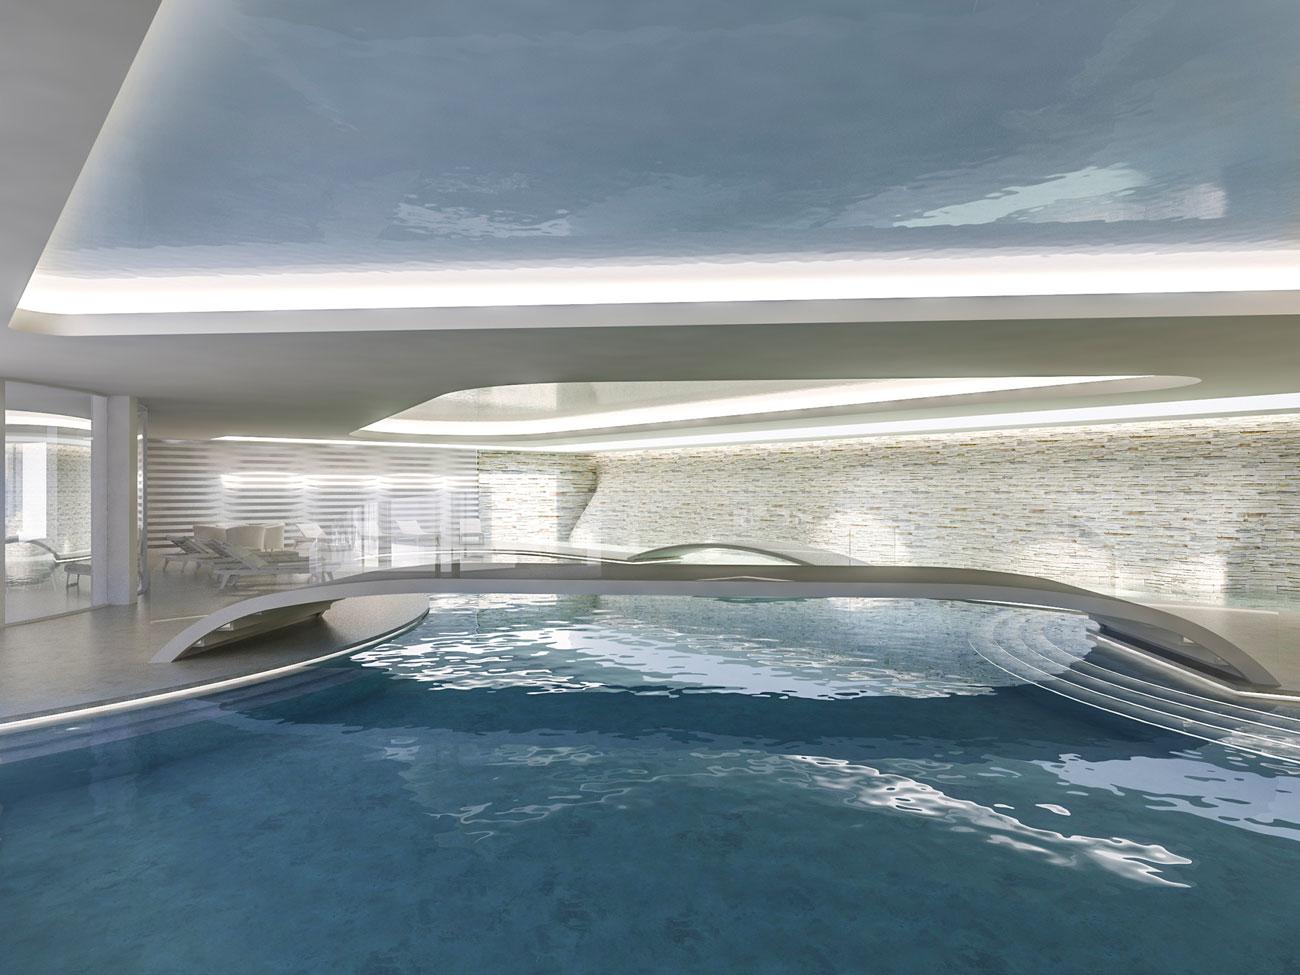 Swimming pool design consultants award winning designs for Pool design uk